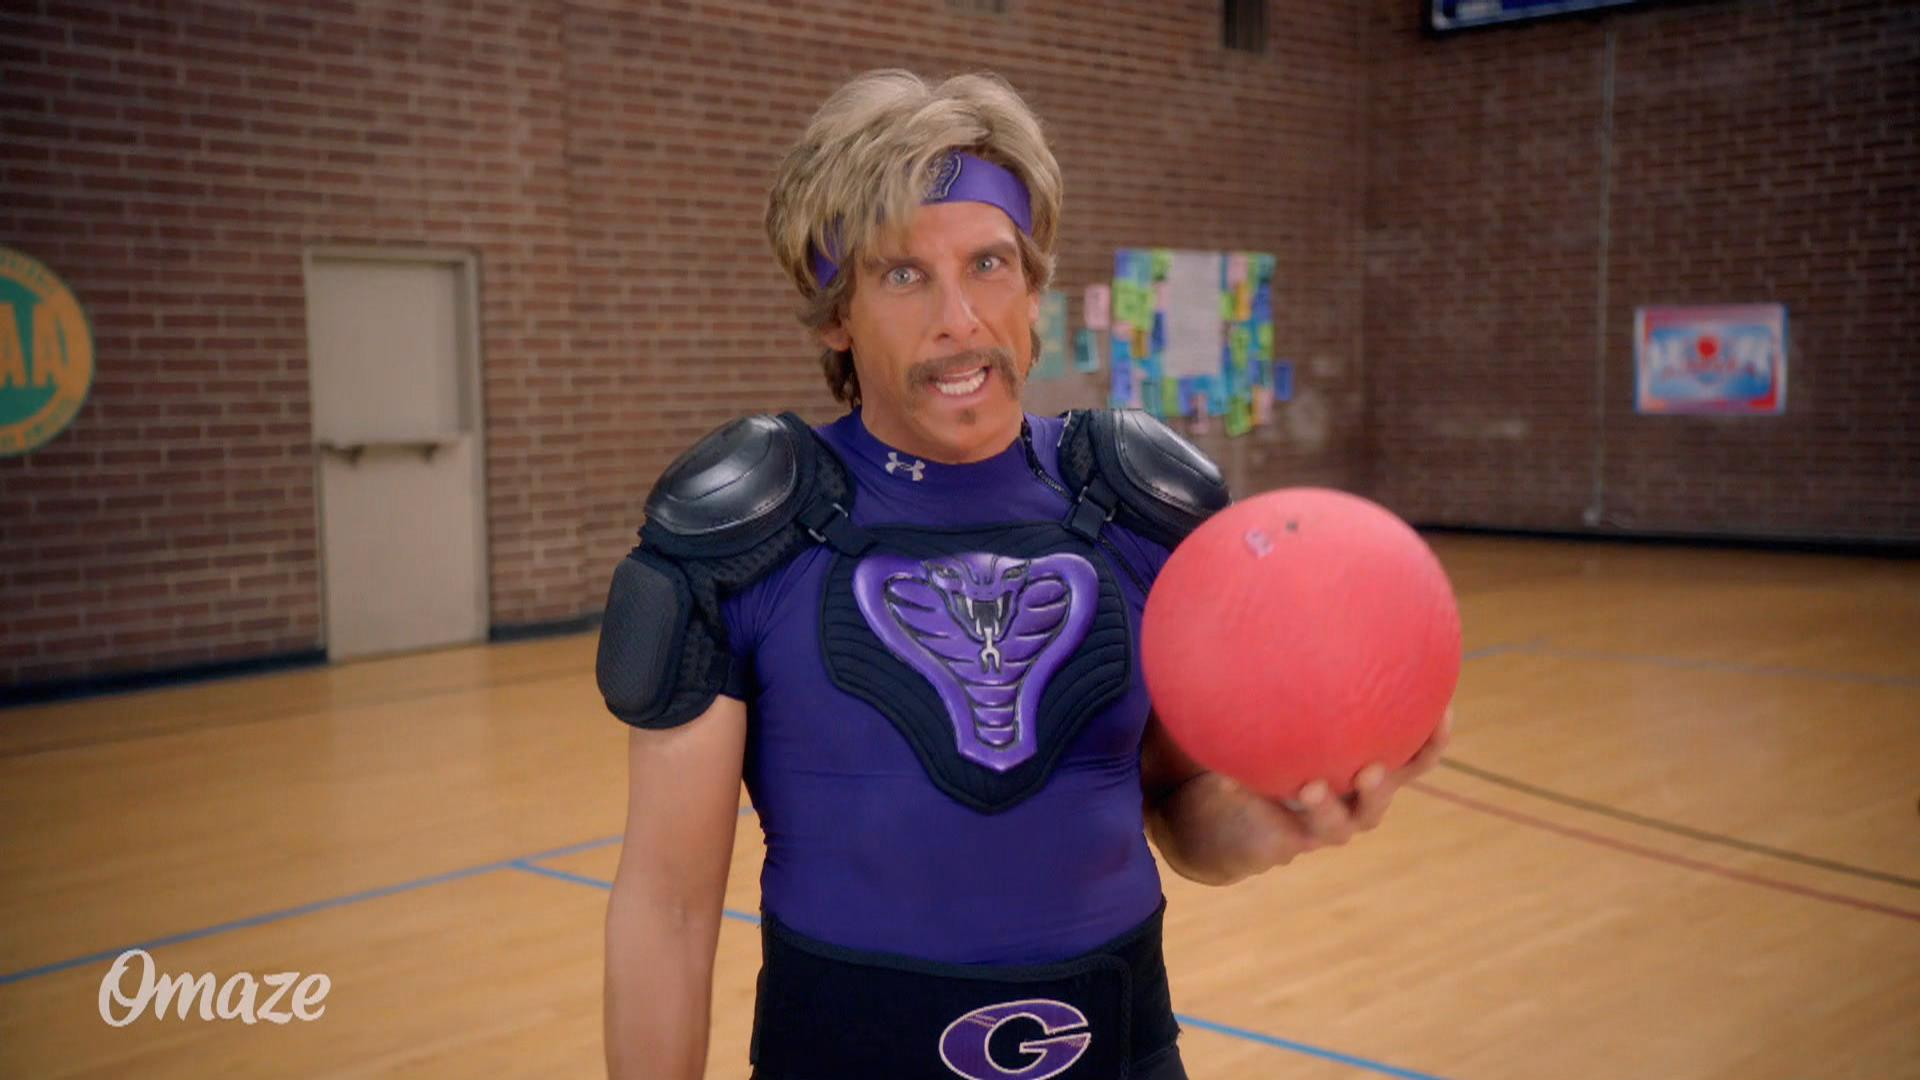 �dodgeball� cast reunites for charity dodgeball game